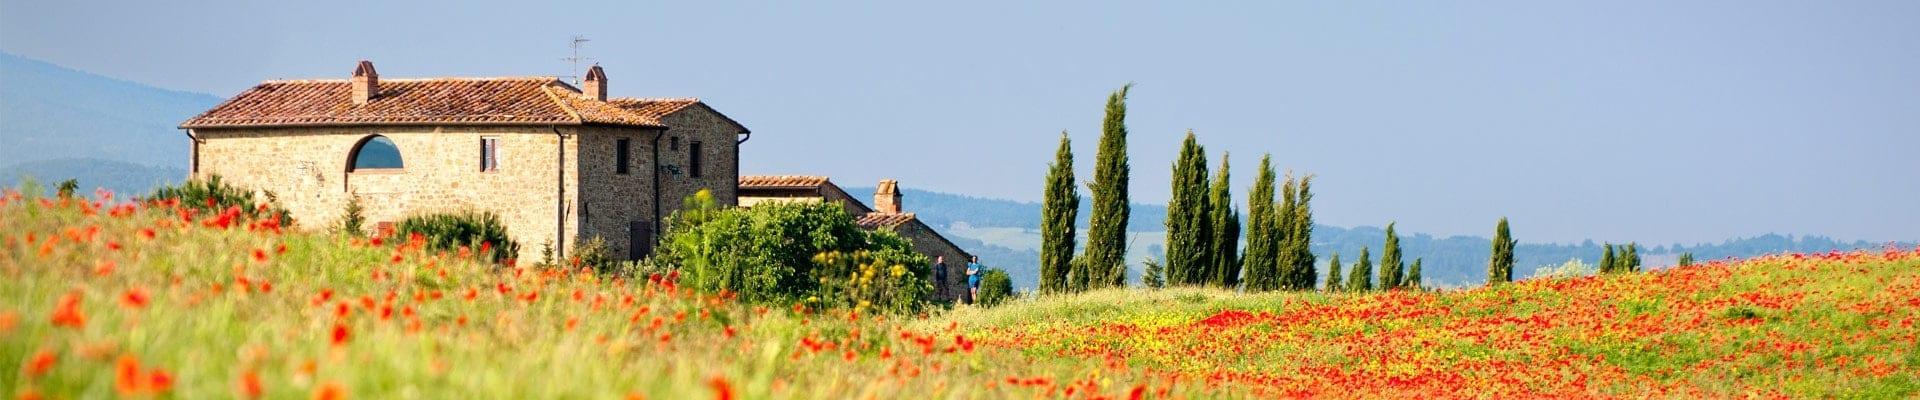 Tuscany-main image